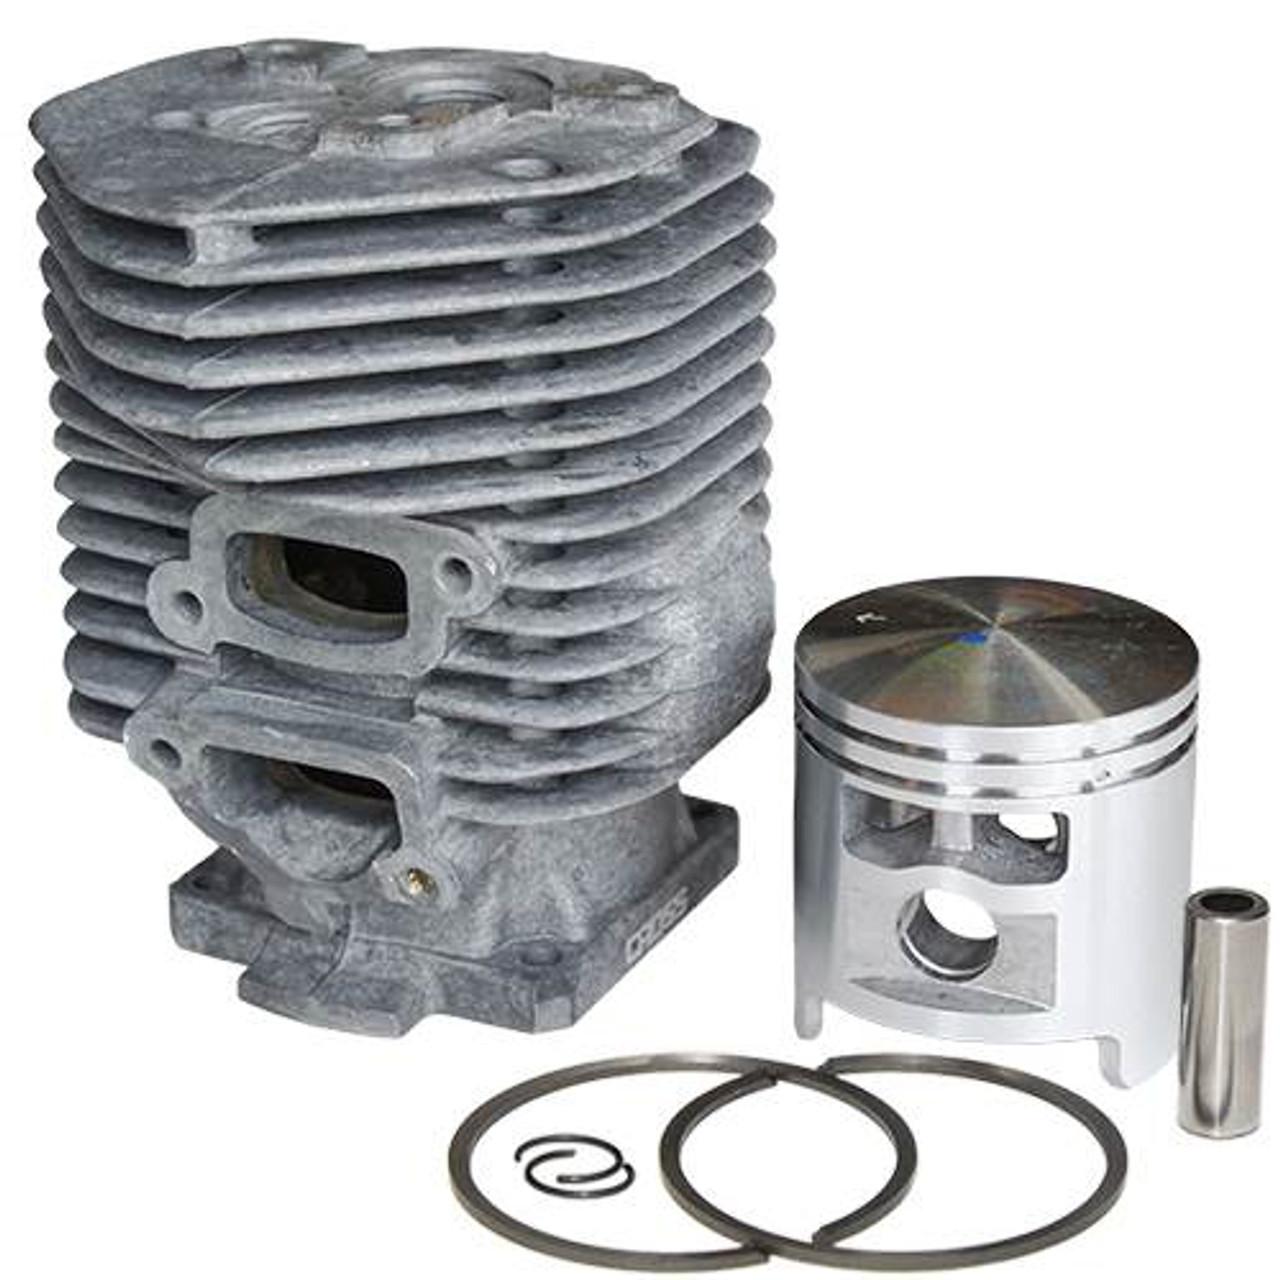 Matraz de cilindro set adecuado para Stihl ts 760 ts760 58 mm Cylinder agujas